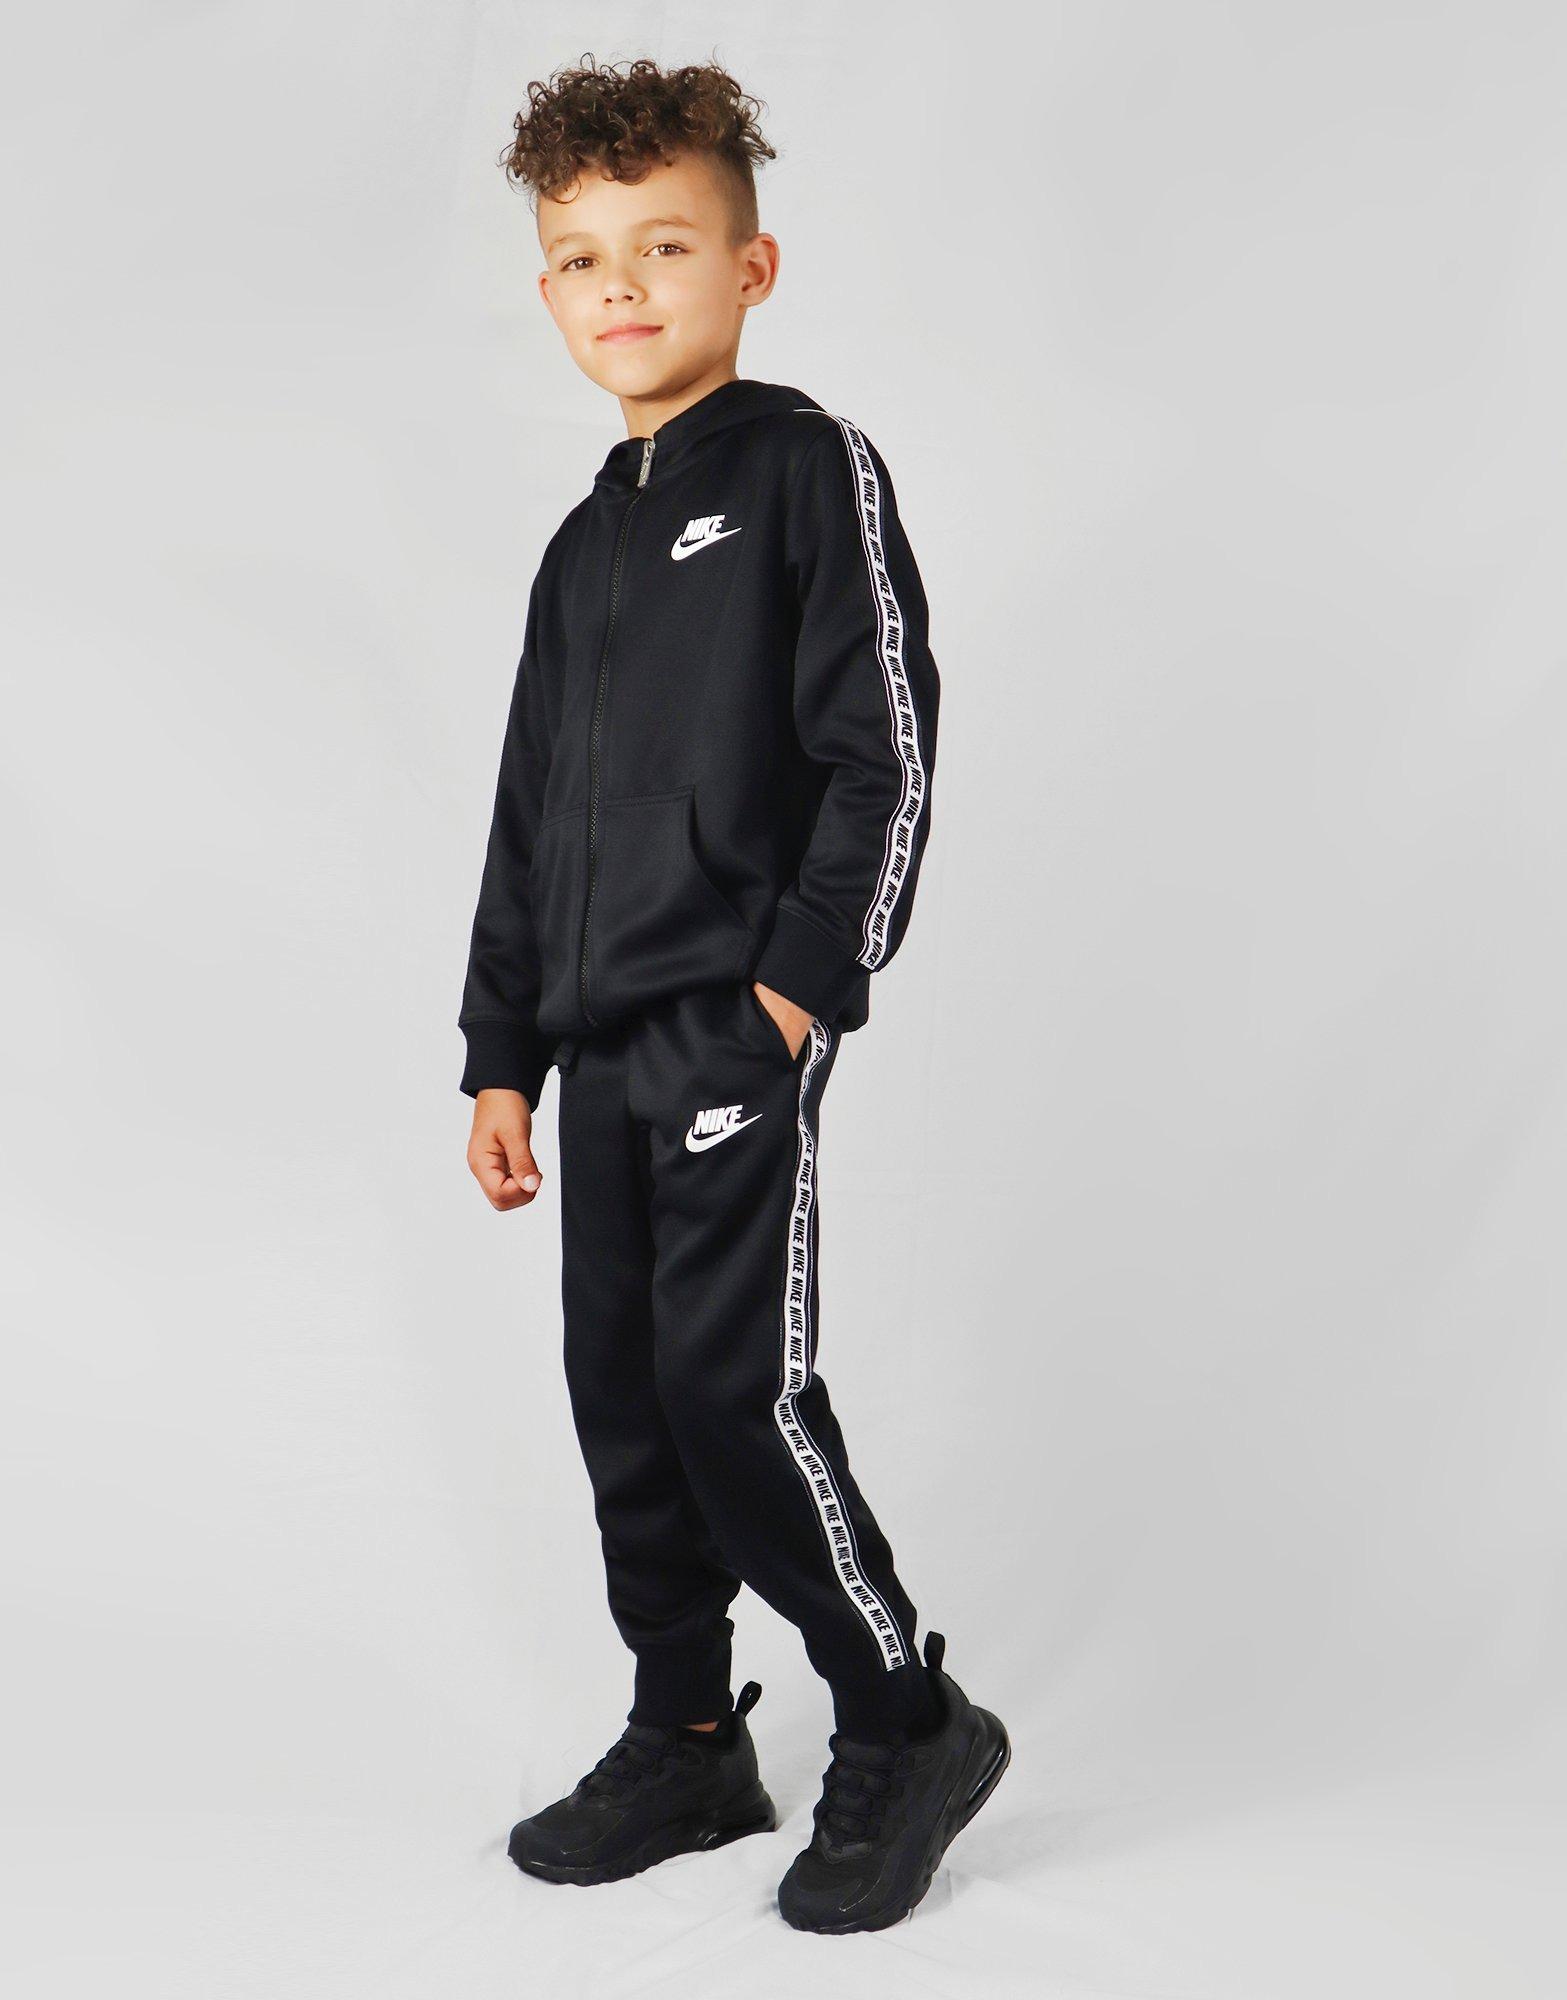 Nike Survêtement Repeat Tape Enfant   JD Sports